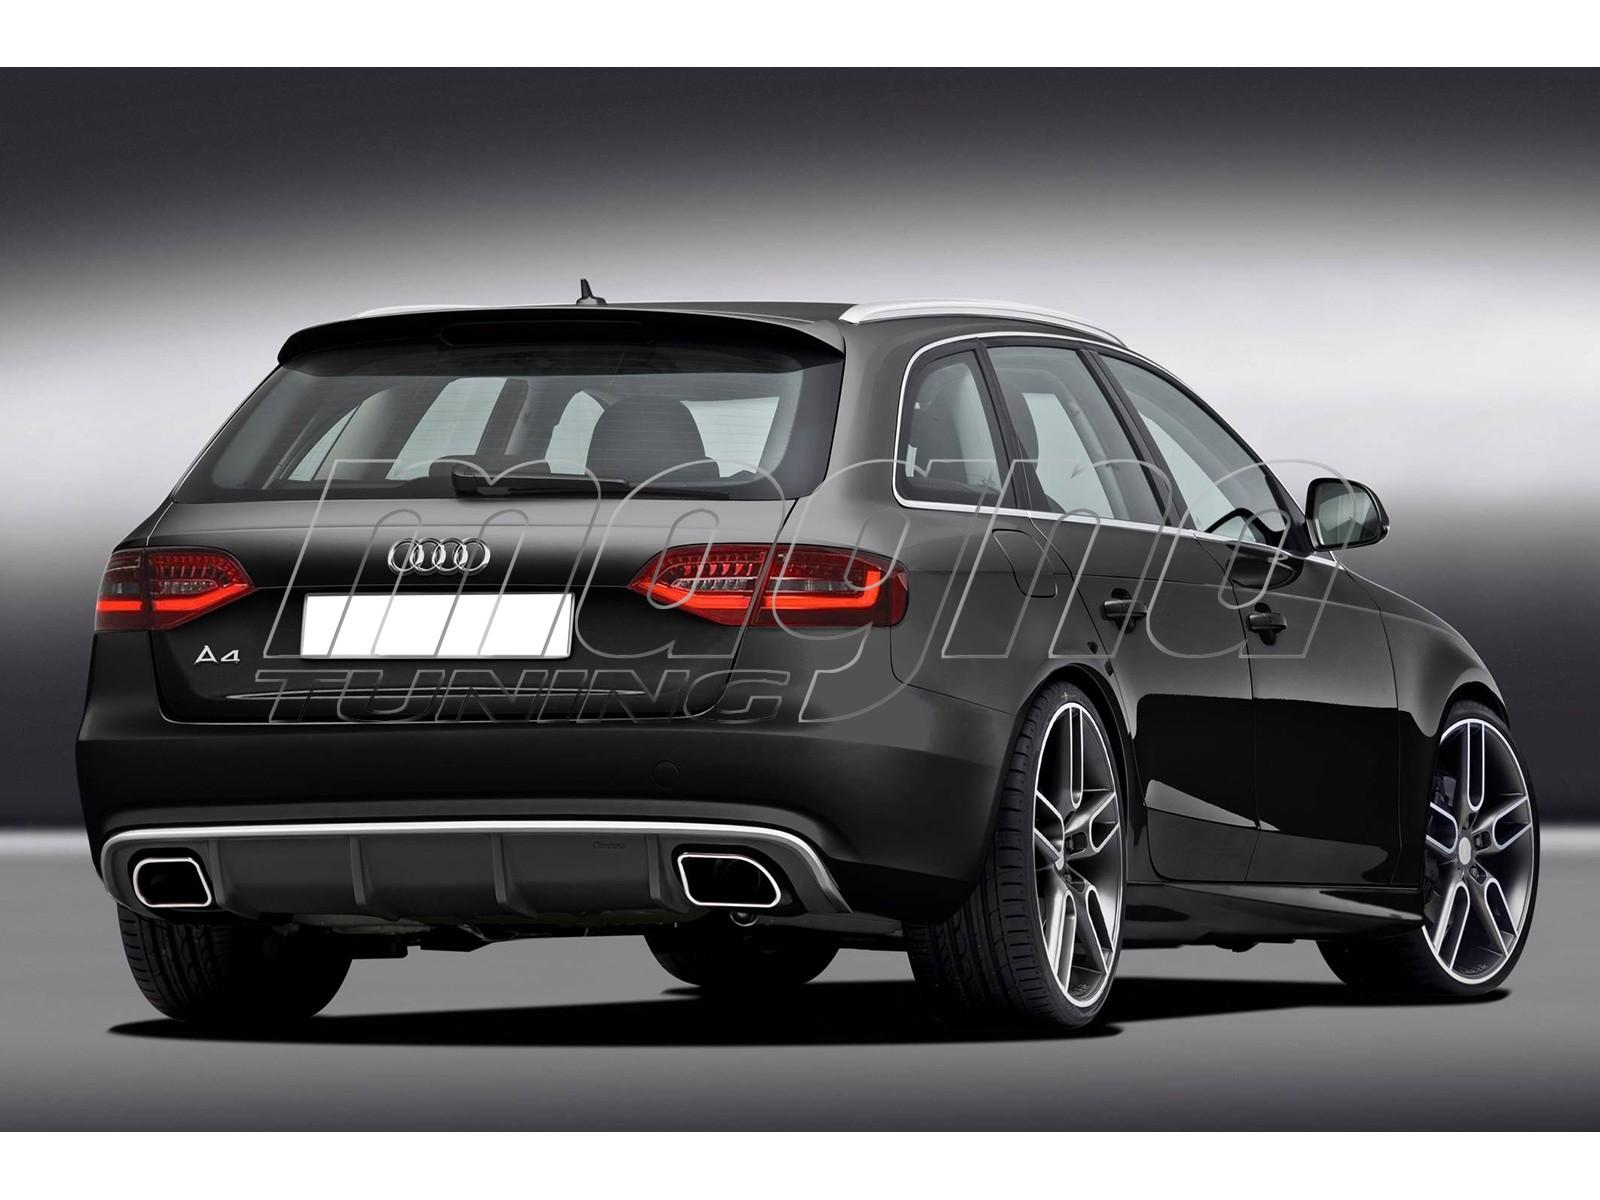 Audi A4 B8 / 8K Facelift CX Rear Bumper Extension